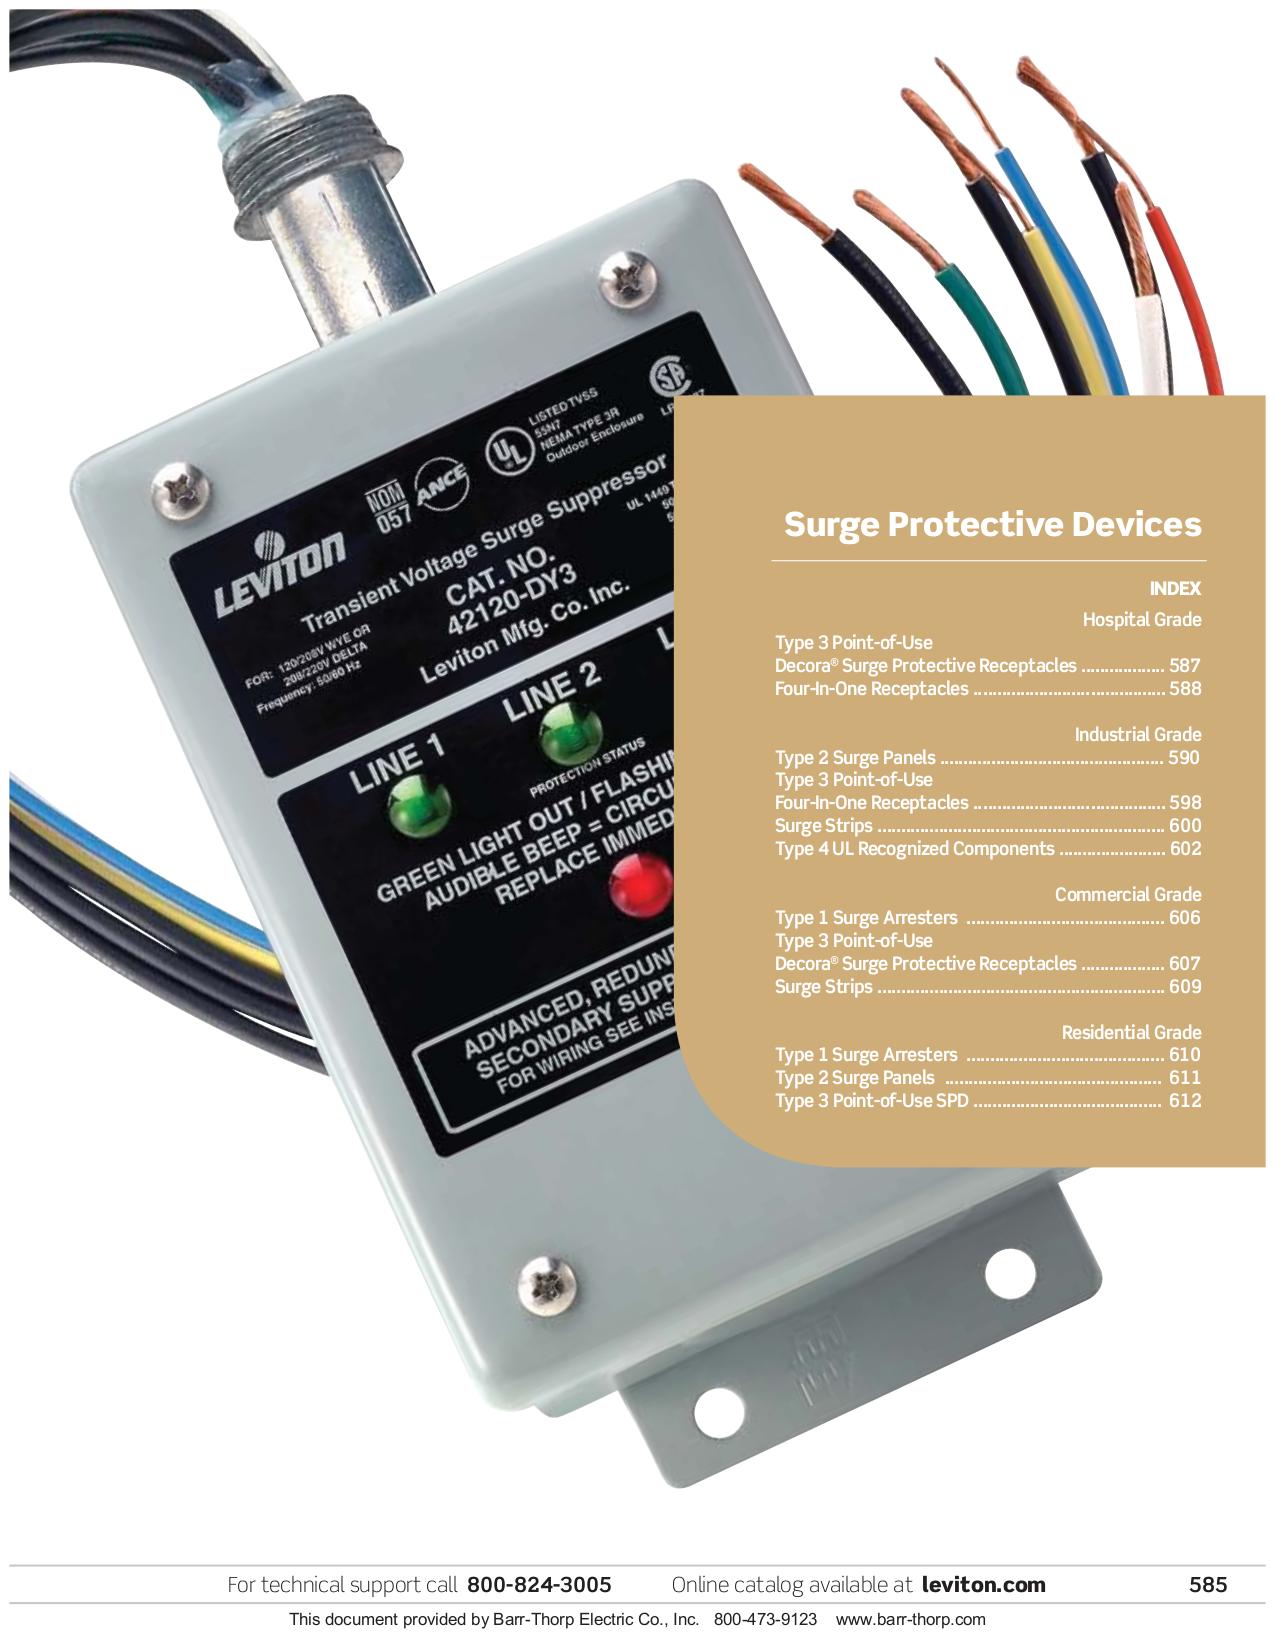 Magnificent Leviton Tech Support Pictures - Electrical Diagram Ideas ...